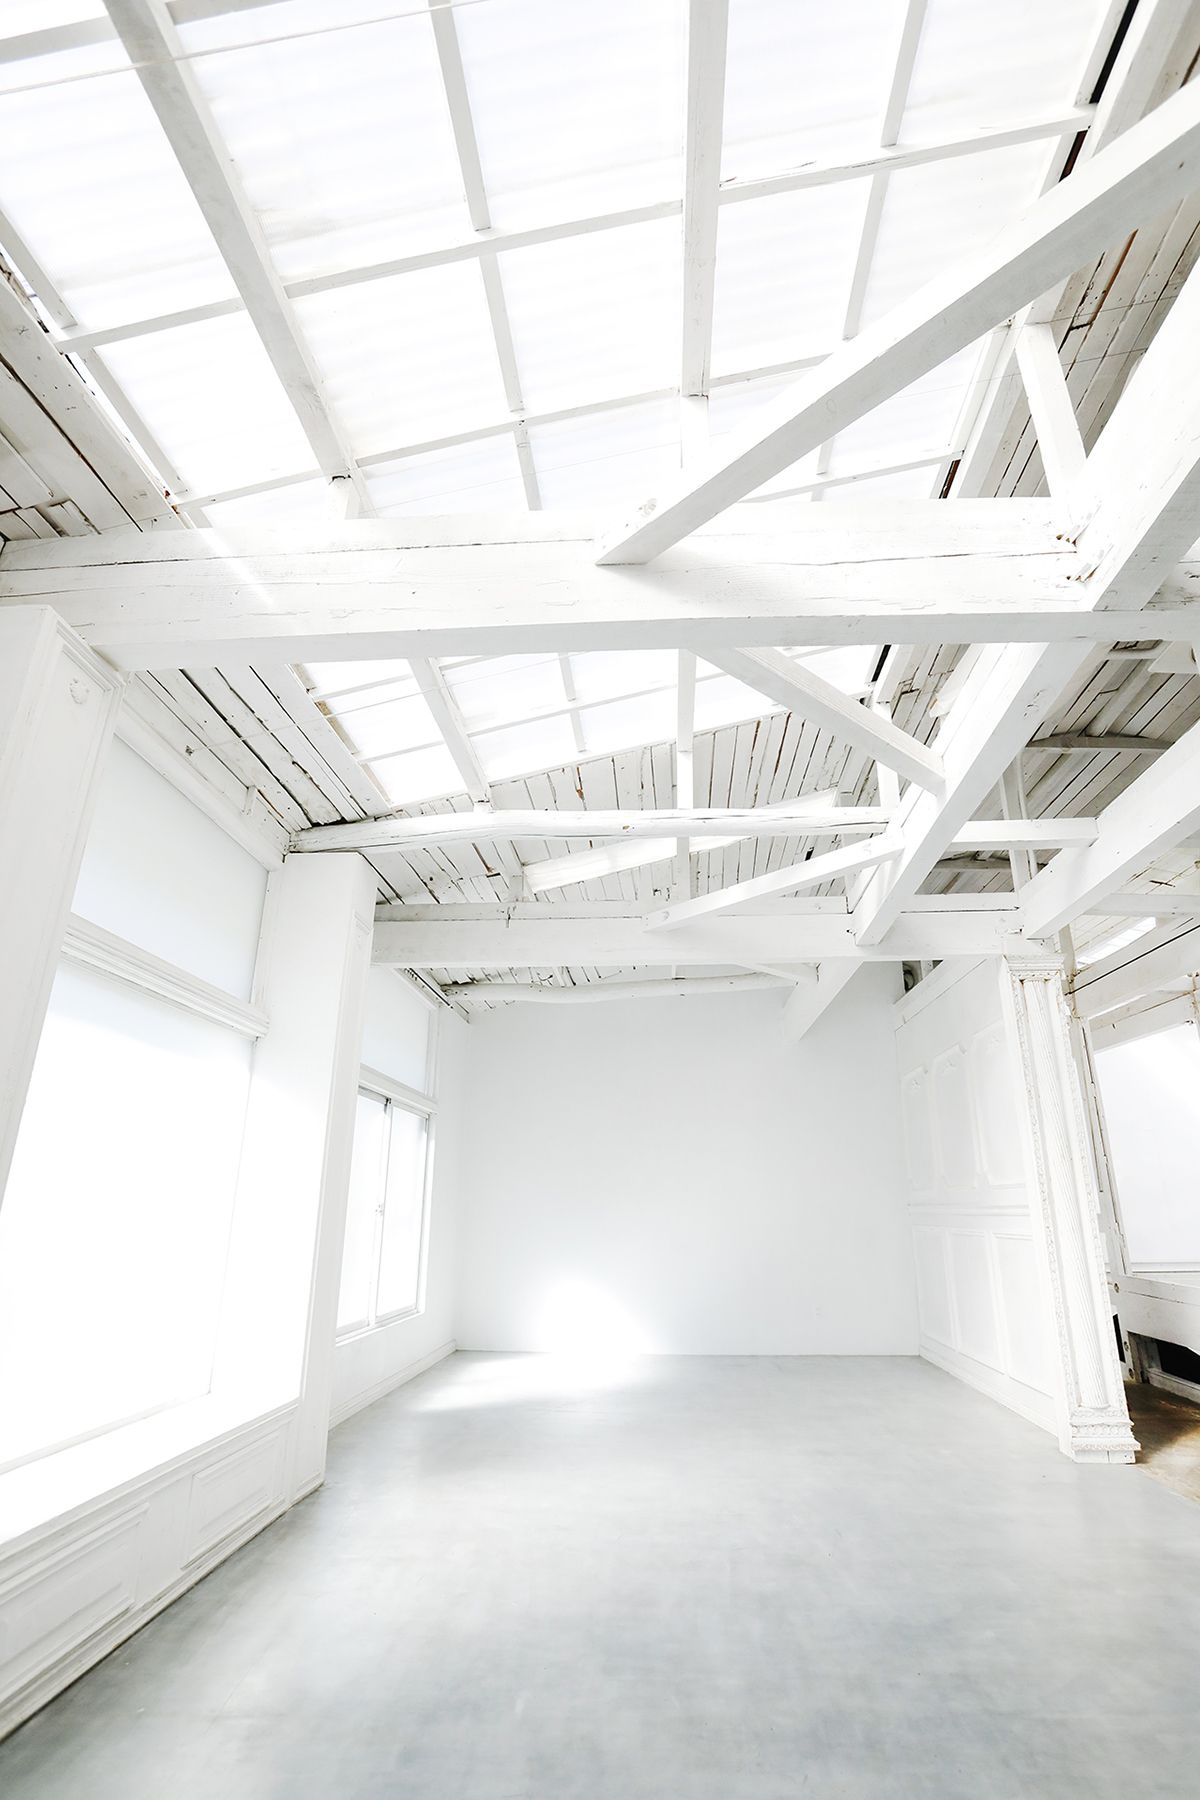 8 EIGHT FLAGS STUDIO (エイトフラッグススタジオ)1F玄関シャッター空き